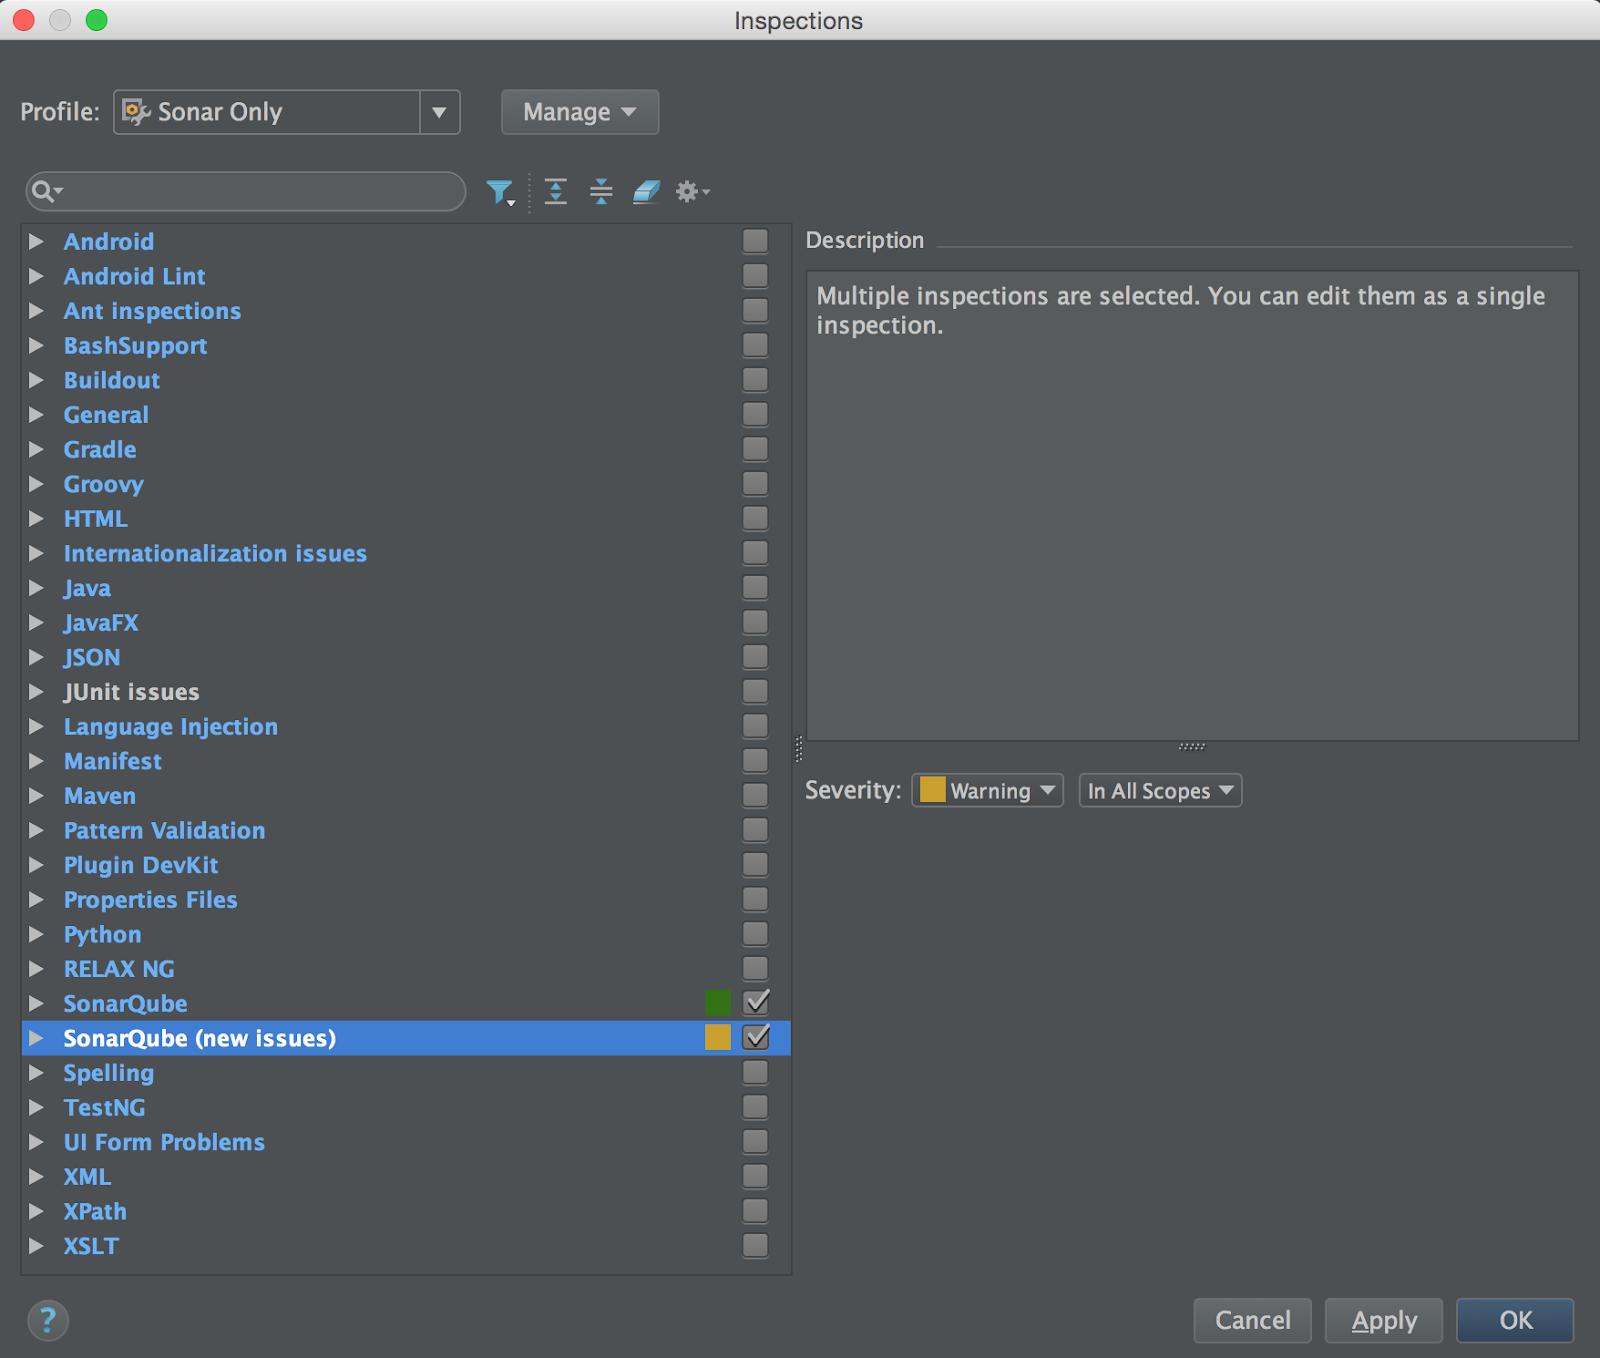 XyLeo Labs Blog: Introducing SonarQube Into Your Workflow